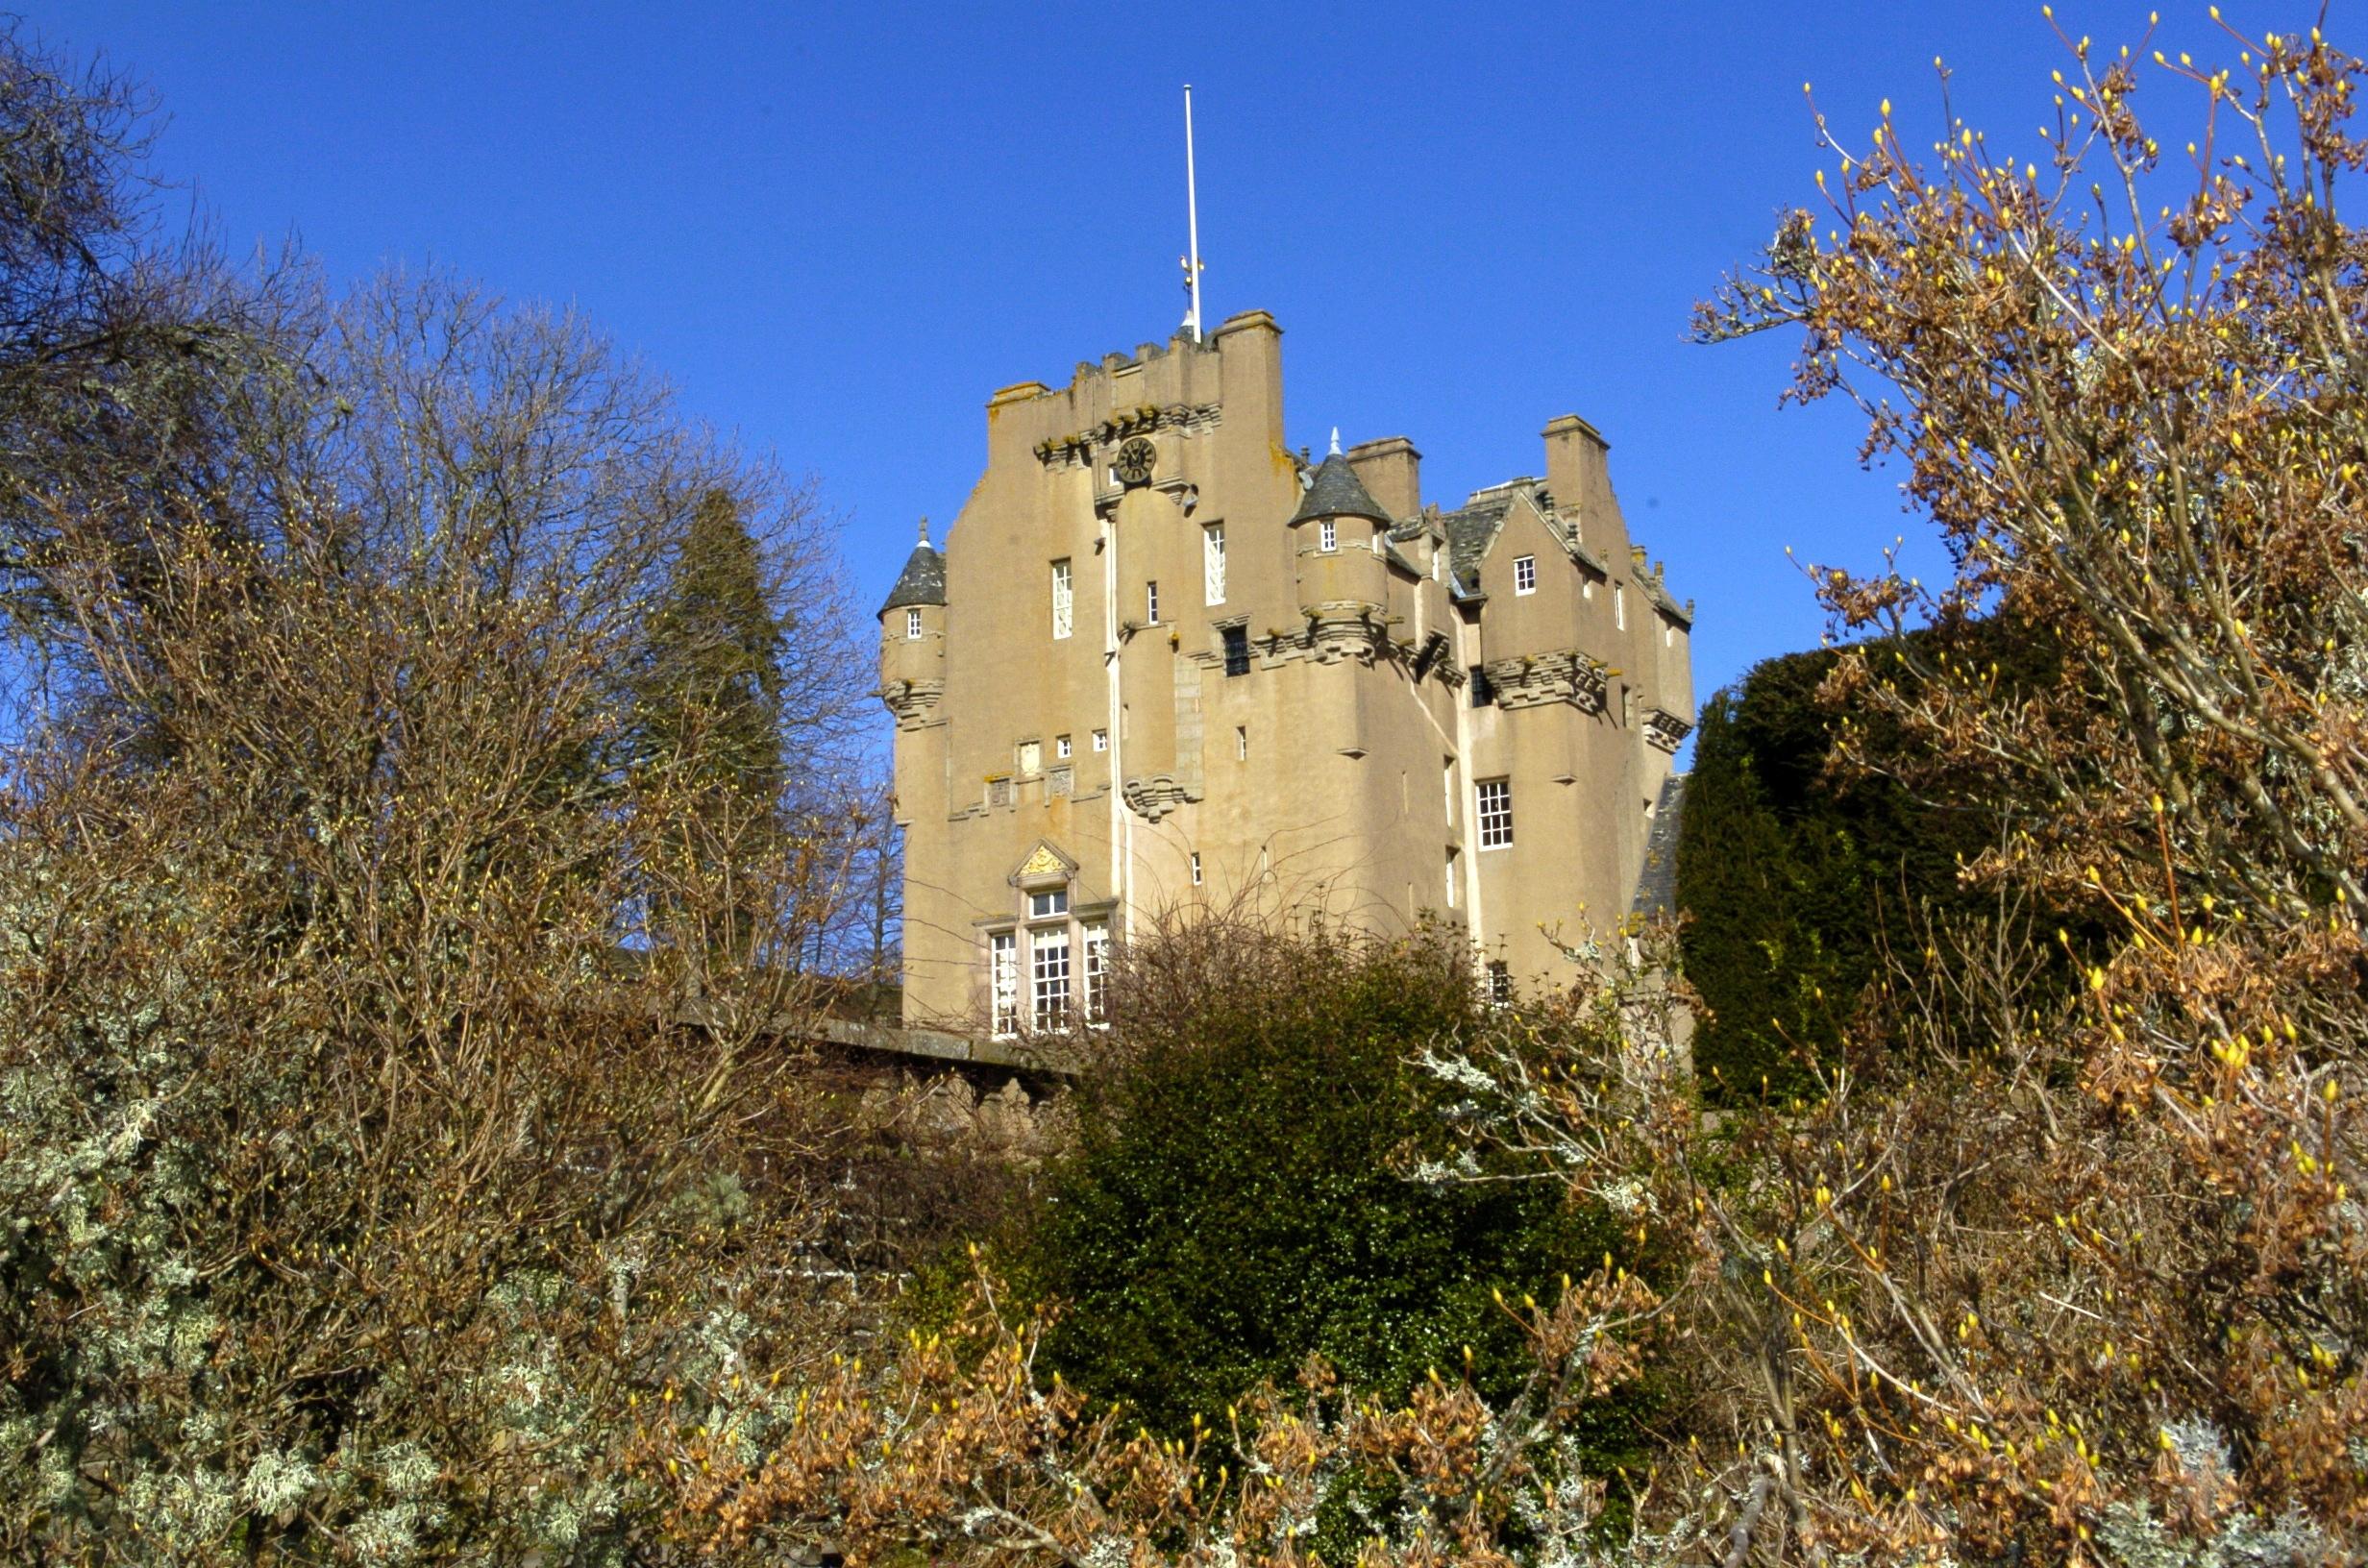 The creature was seen near Crathes Castle.